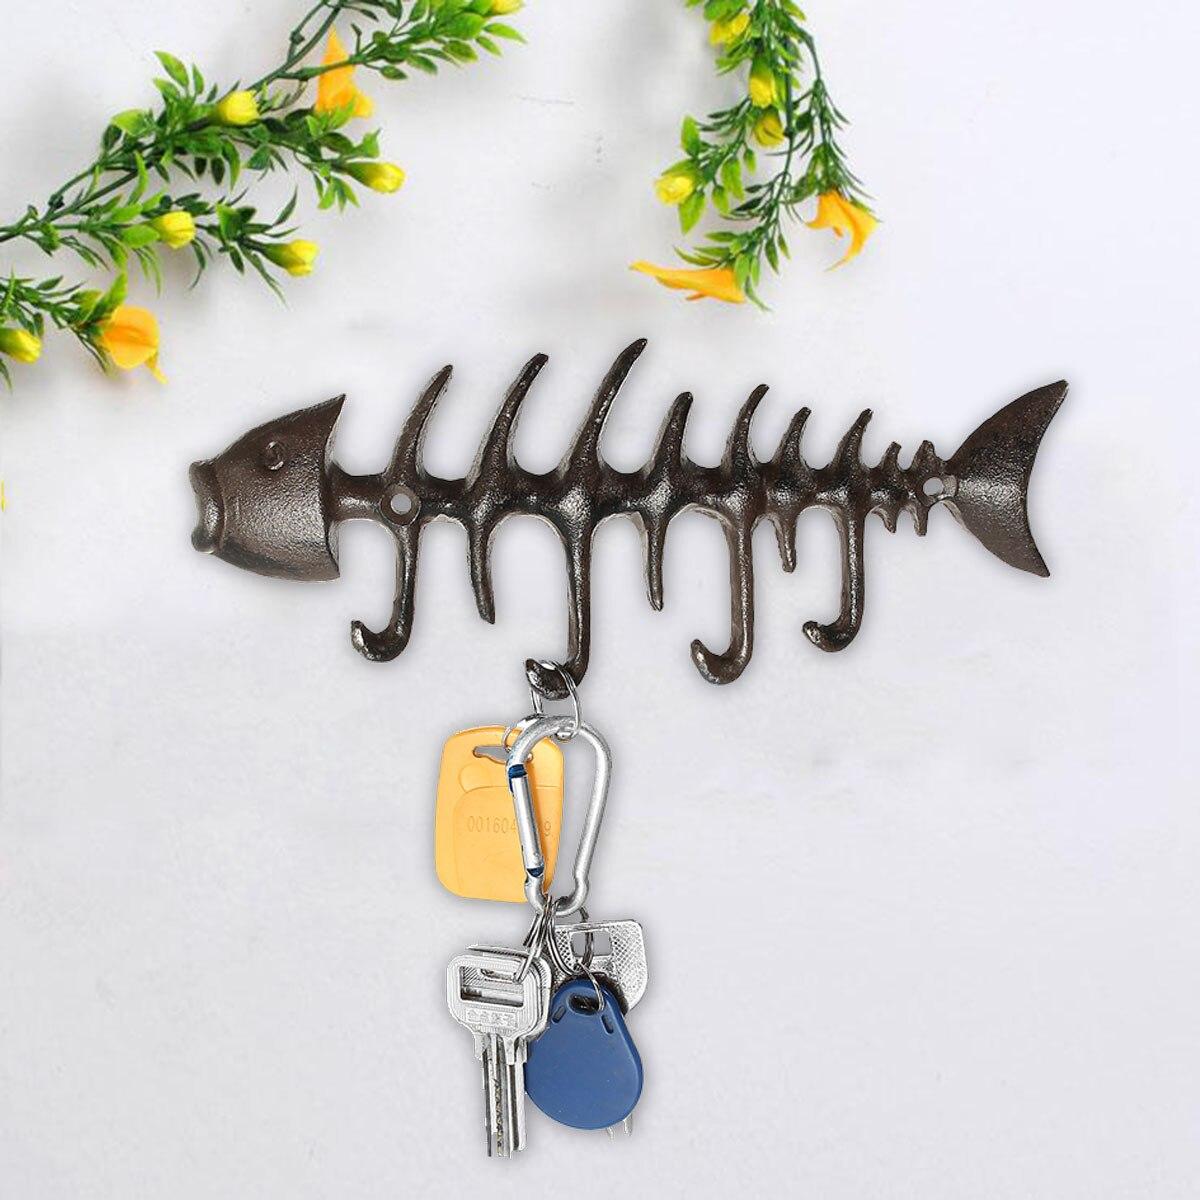 Rustic Wall Mount Hook Cast Iron Coat Key Clothes Towel Hat Fish Bone Peg Door Wall Window Hanger Holder Home Kitchen